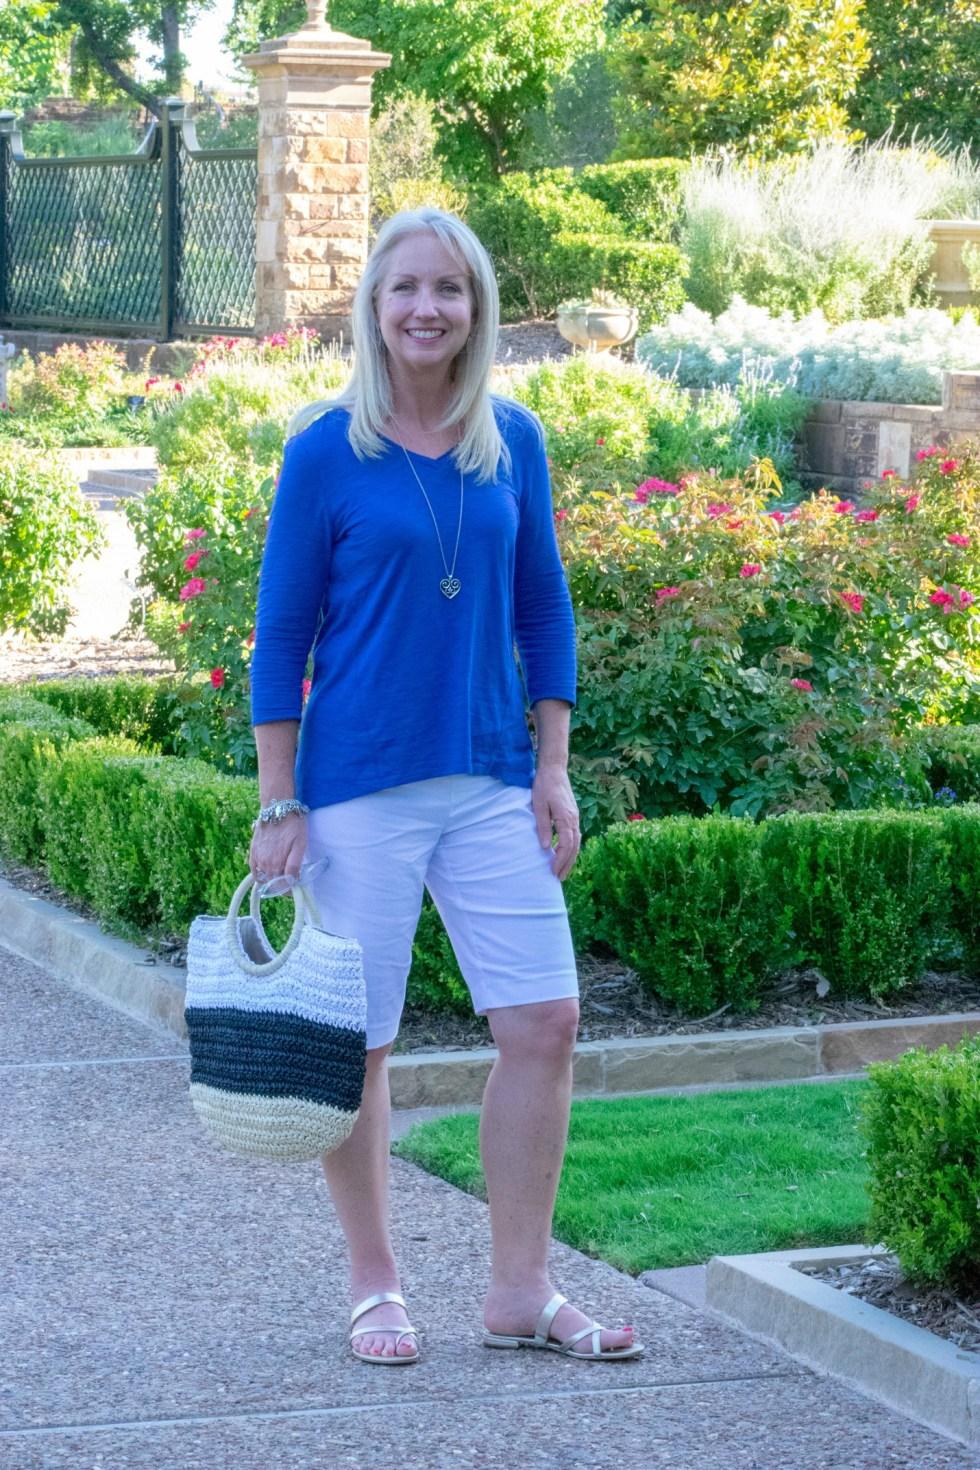 How to Wear Bermuda Shorts